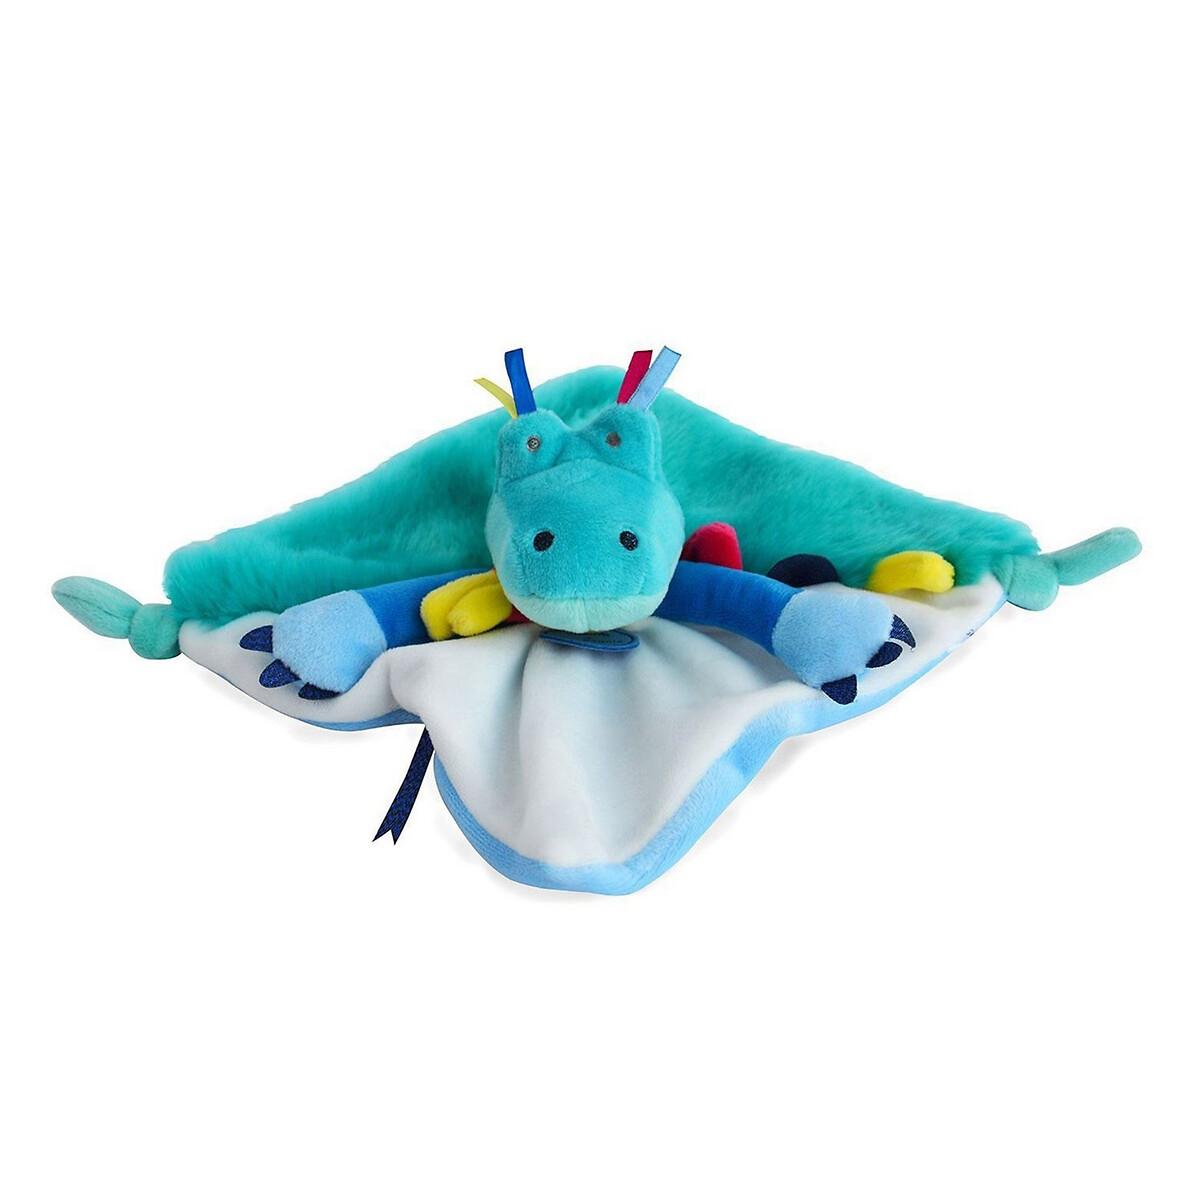 An image of Doudou Et Compagnie Newborn Tropicool Crocodile Comforter - 22cm